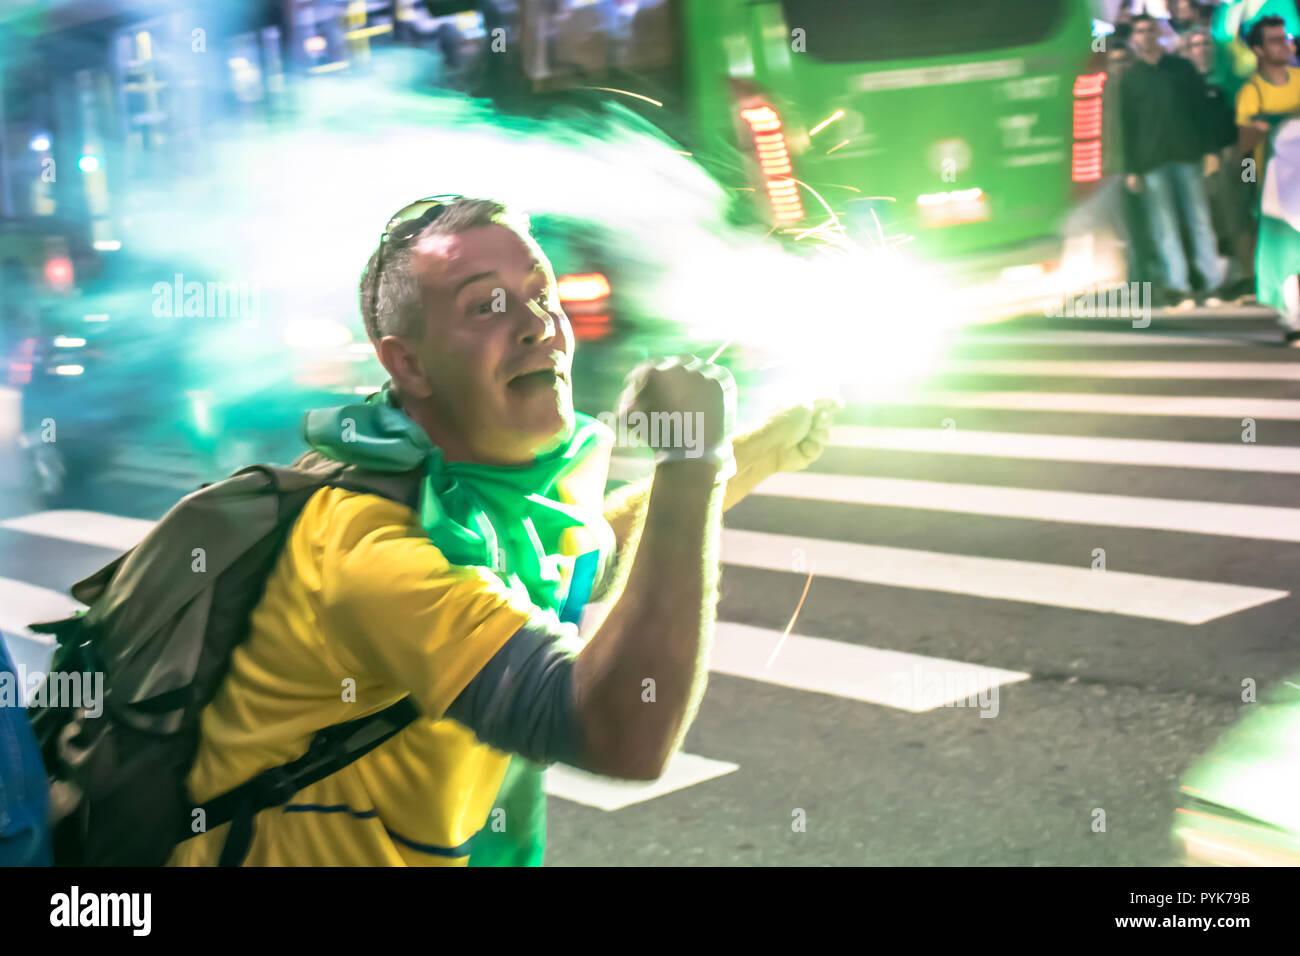 São Paulo, Brazil, October 28, 2018. Supporters celebrate Bolsonaro victory in São Paulo - Supporters of President-elect Jair Bolsonaro celebrate the candidate's victory at the Paulista Avenue. Credit: Alf Ribeiro/Alamy Live News - Stock Image